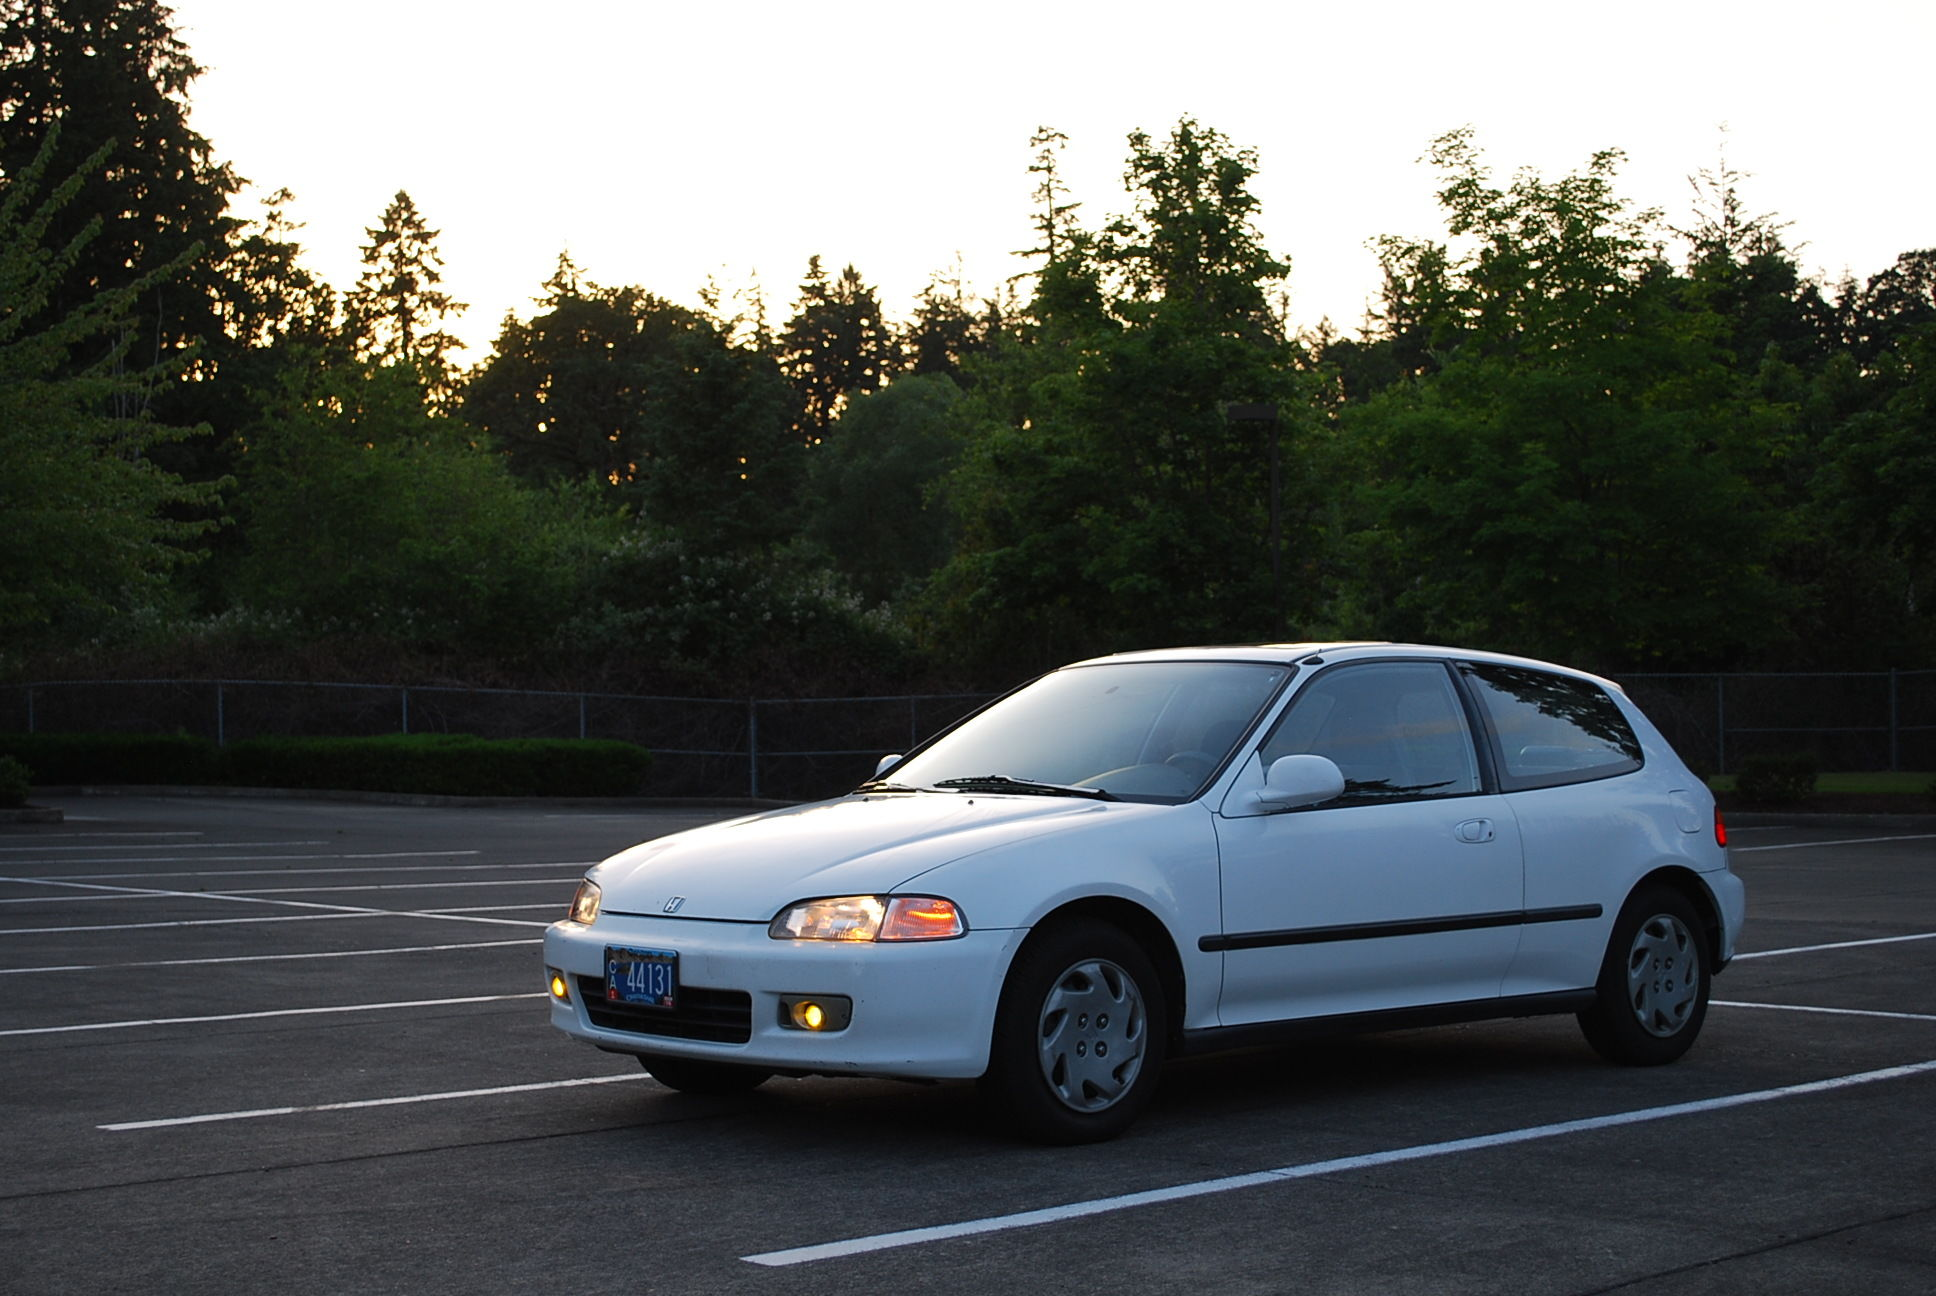 Weatherall123 U0026 39 S 1994 Honda Civic Si Hatchback Build  Restoration - Honda-tech